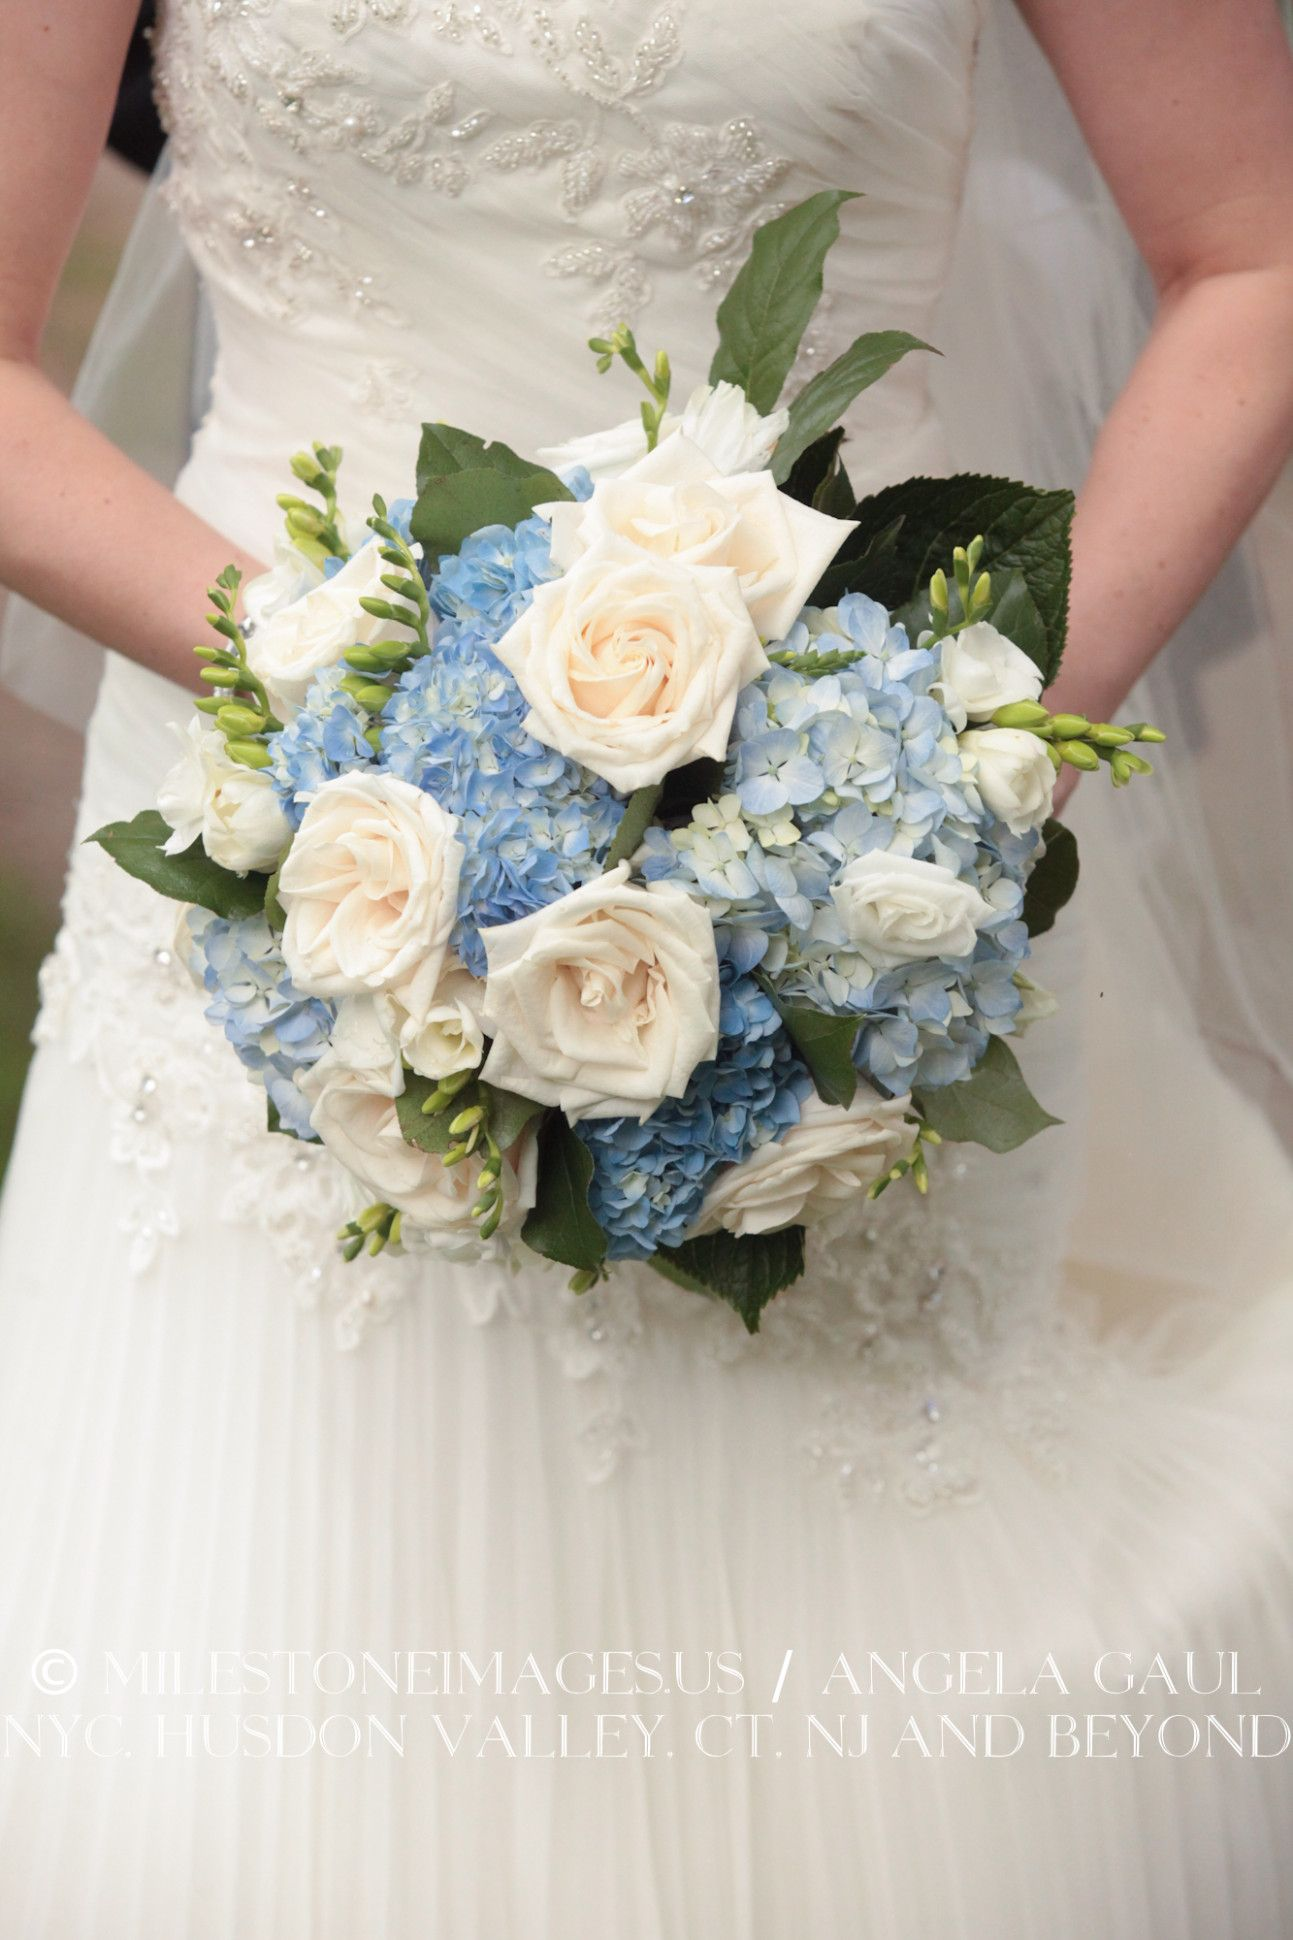 Wedding Bouquets Hydrangea And Roses Blue Wedding Bouquet Hydrangea Bouquet Wedding Flower Bouquet Wedding